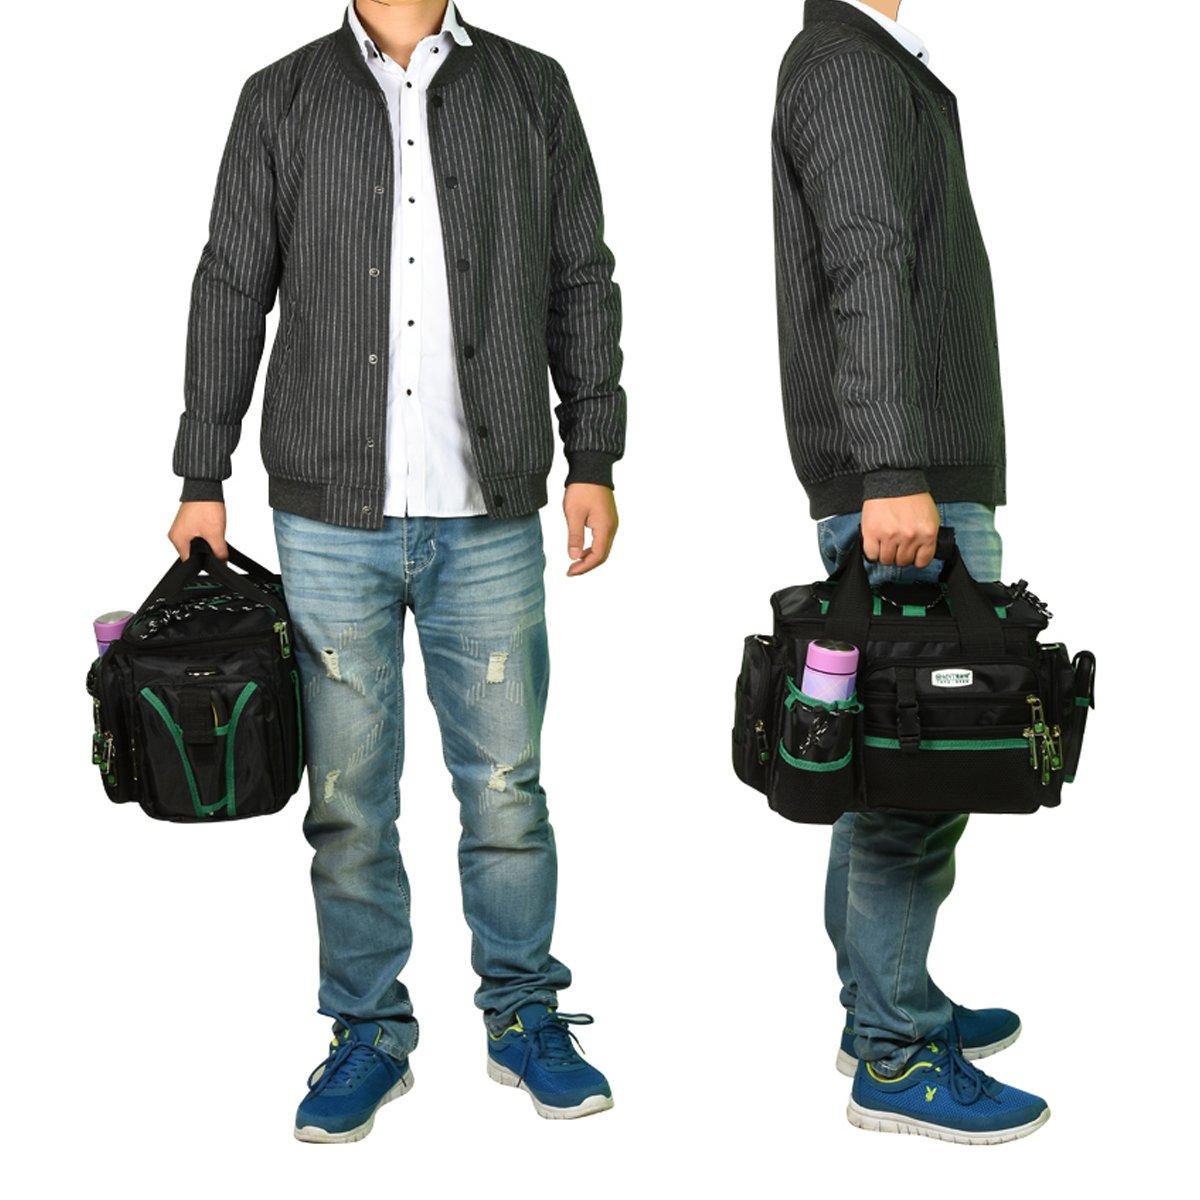 Tool Organizers Electrician Heavy Duty Tool Bag Tote Storage Waterproof Portable